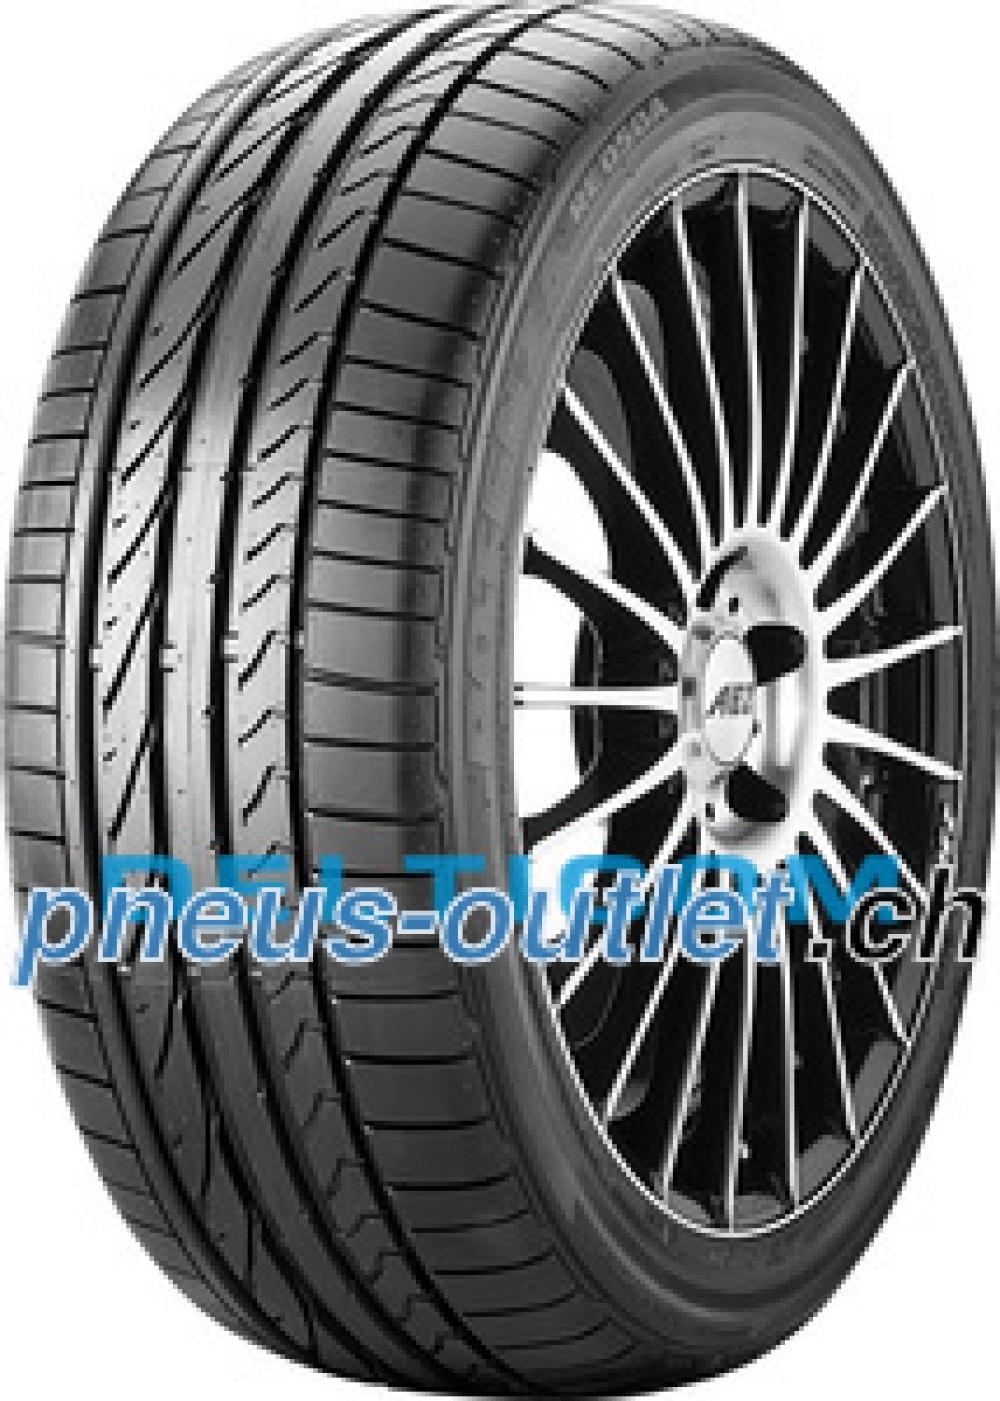 Bridgestone Potenza RE 050 A EXT ( 285/35 R18 97Y MOE, runflat, avec protège-jante (MFS) )